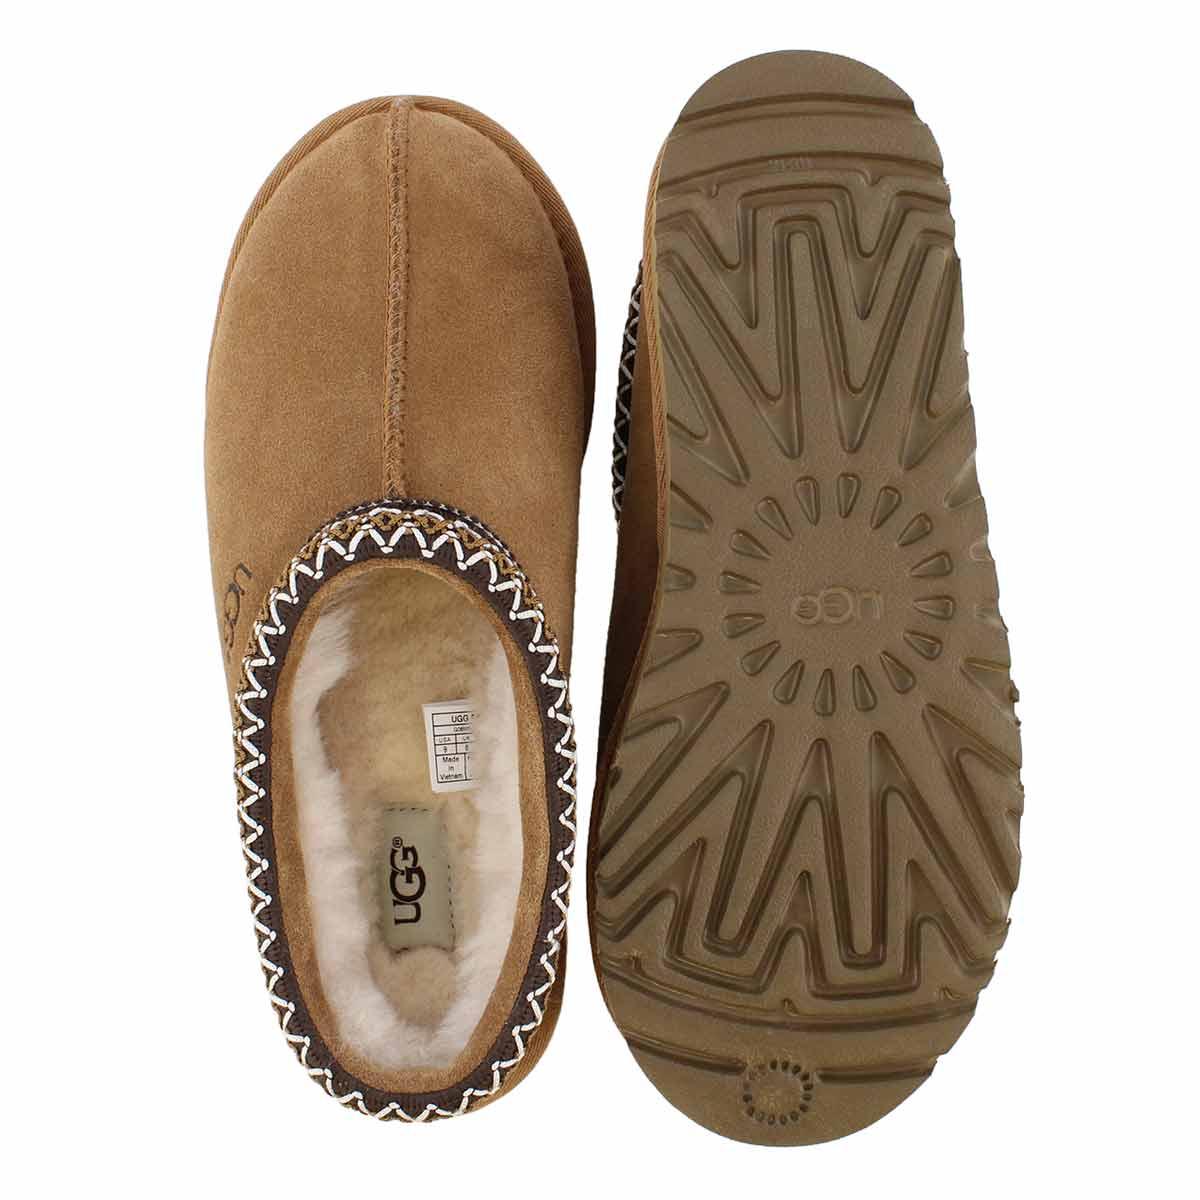 Mns Tasman chestnut sheepskin slipper